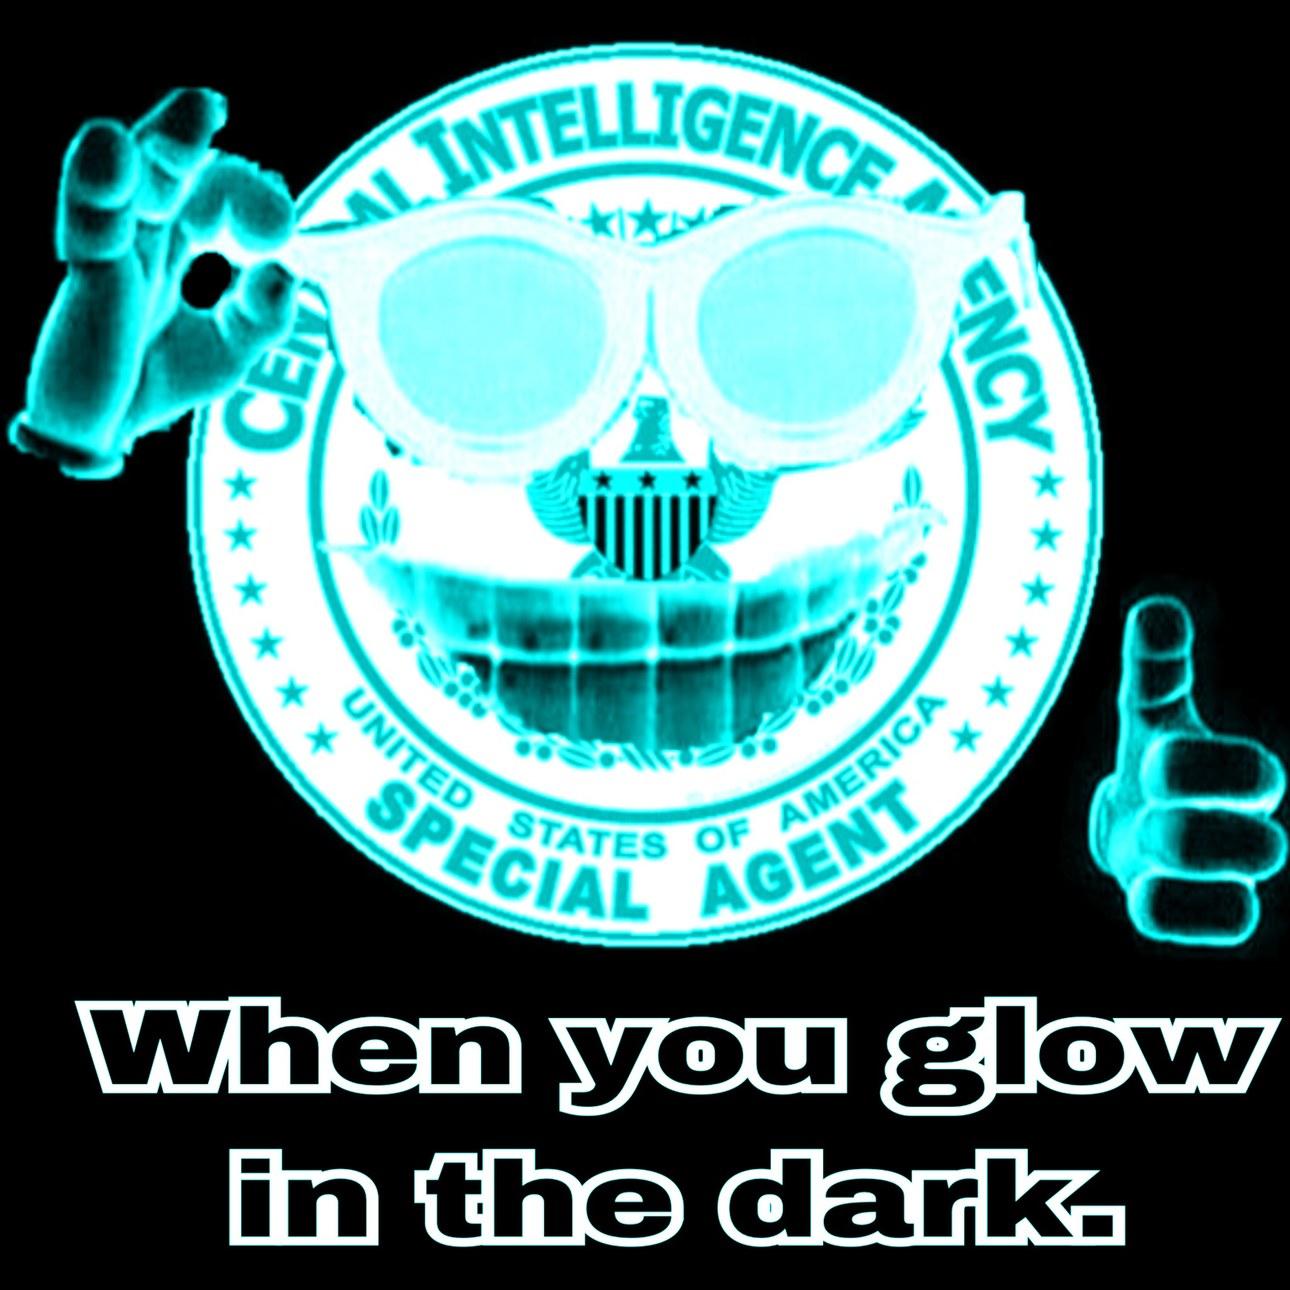 The CIA Gingers glow in the dark - meme